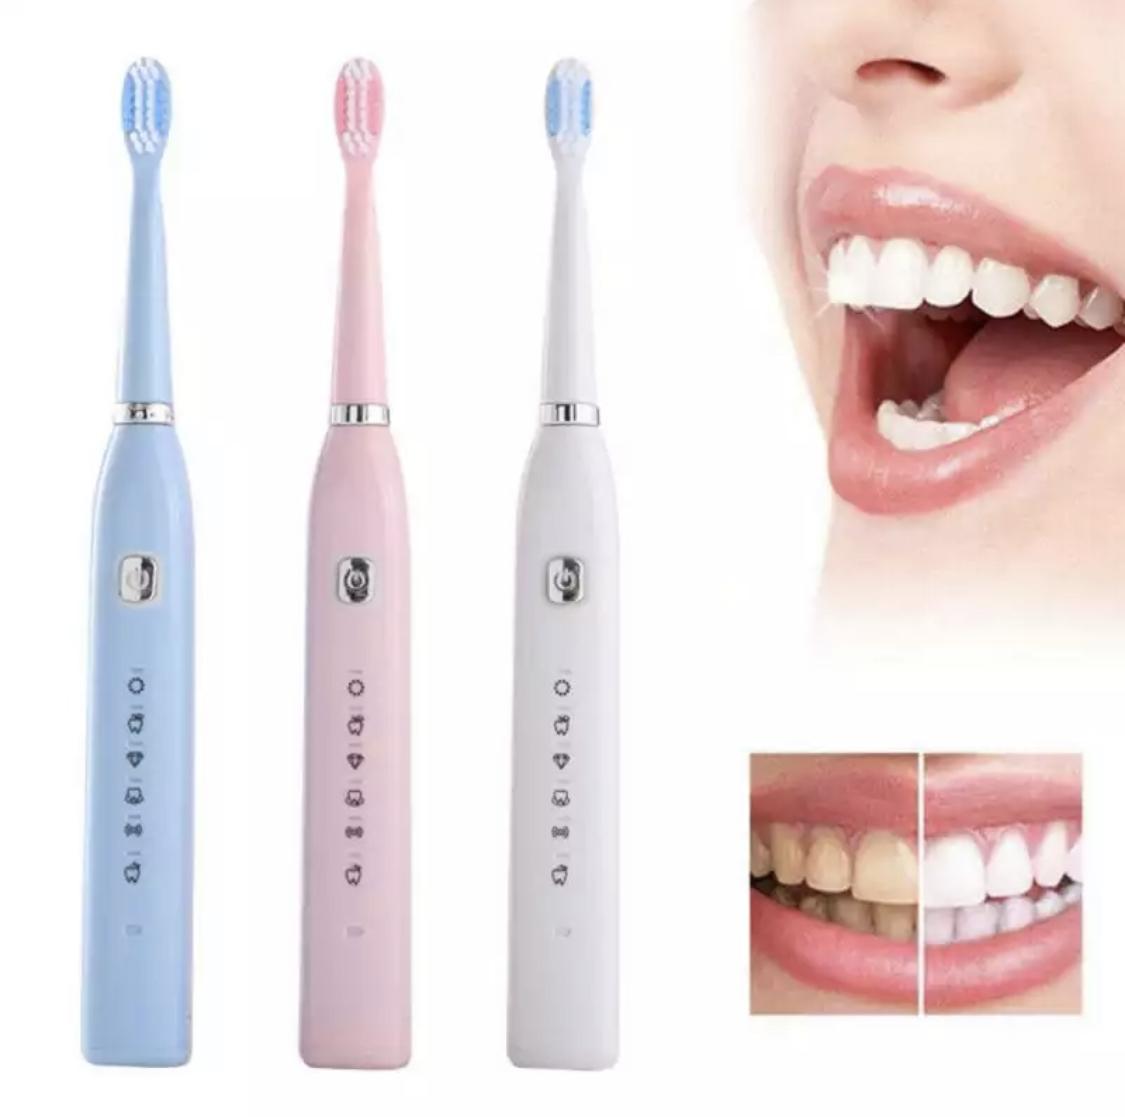 Oral Accessories